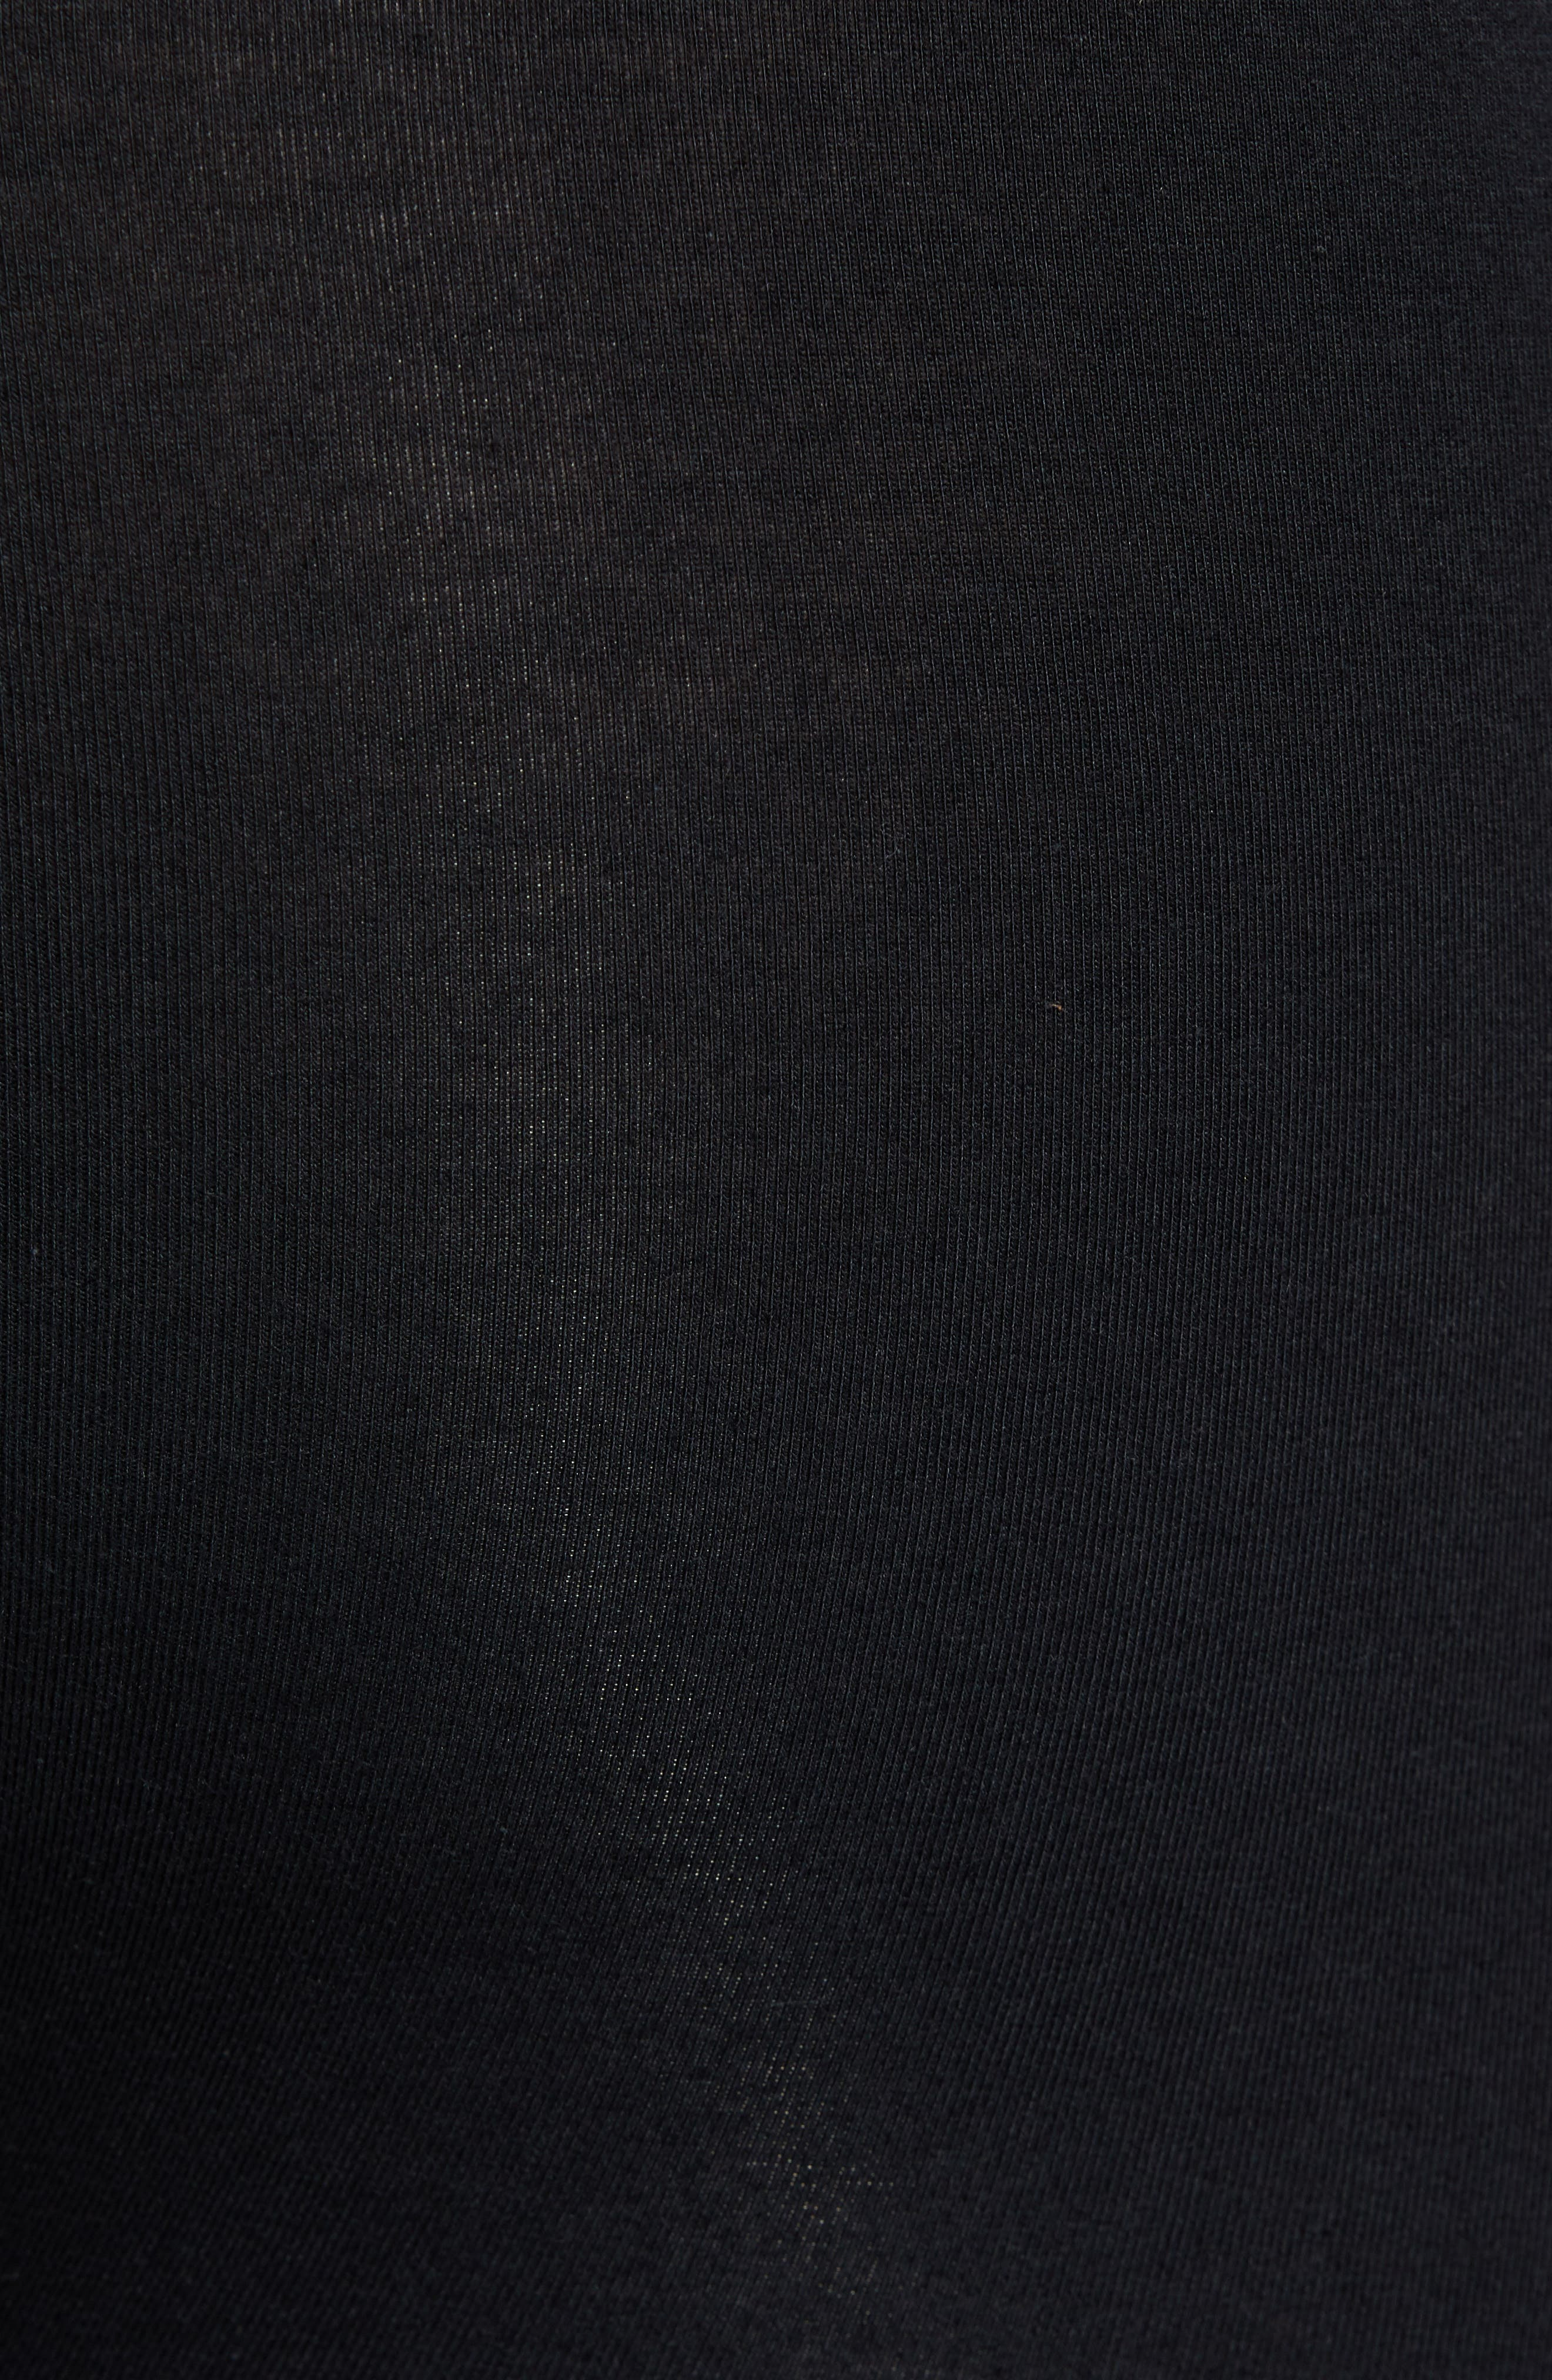 POLO RALPH LAUREN,                             2-Pack Cotton & Modal Boxer Briefs,                             Alternate thumbnail 6, color,                             POLO BLACK